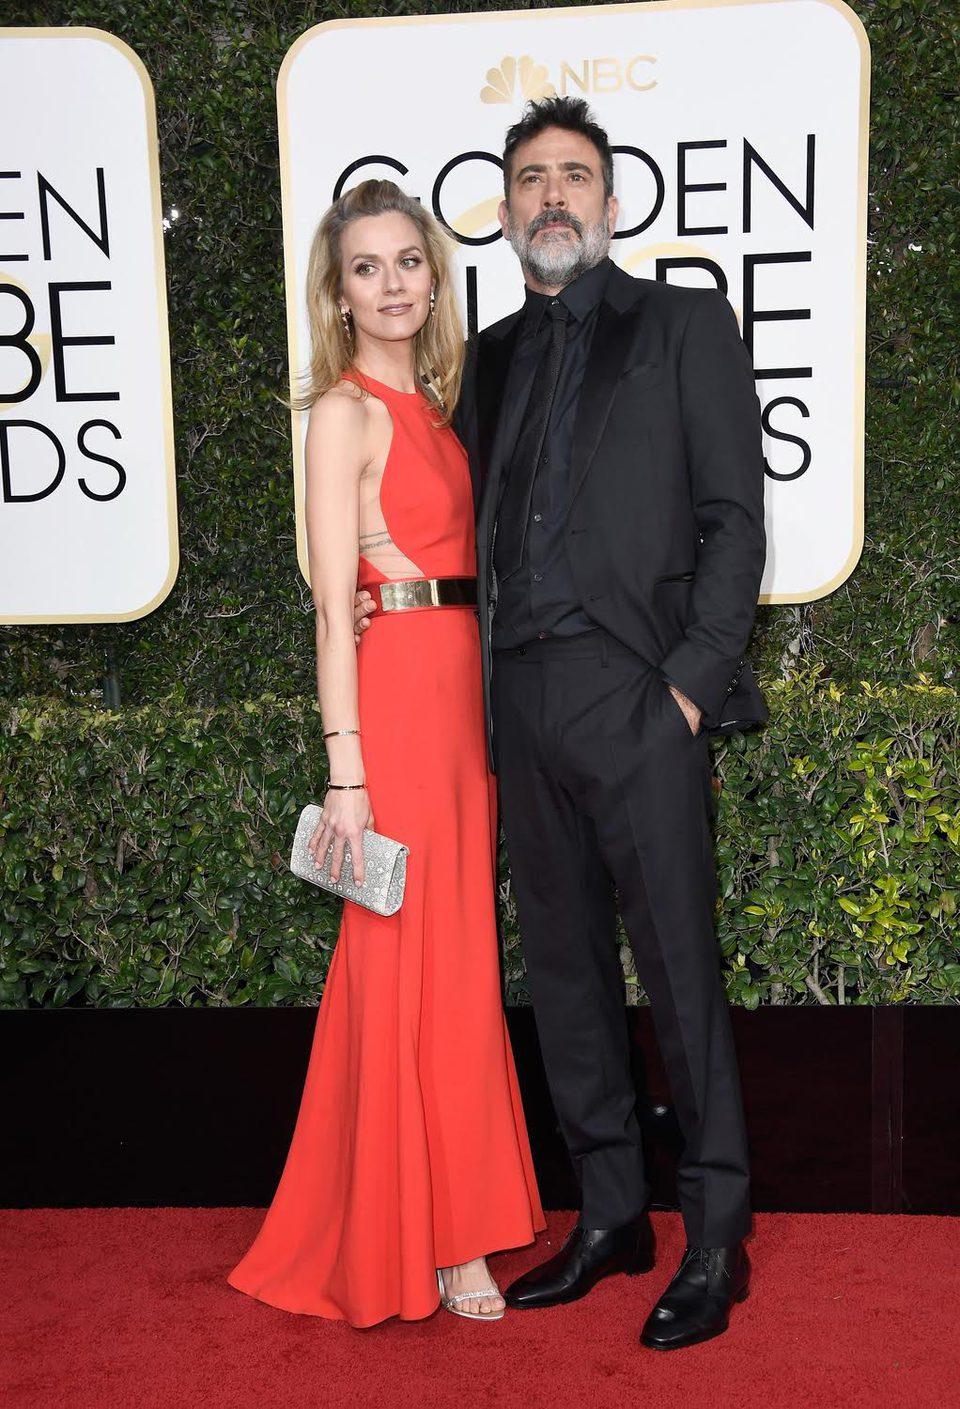 Jeffrey Dean Morgan and Hilarie Burton at Golden Globes 2017 red carpet